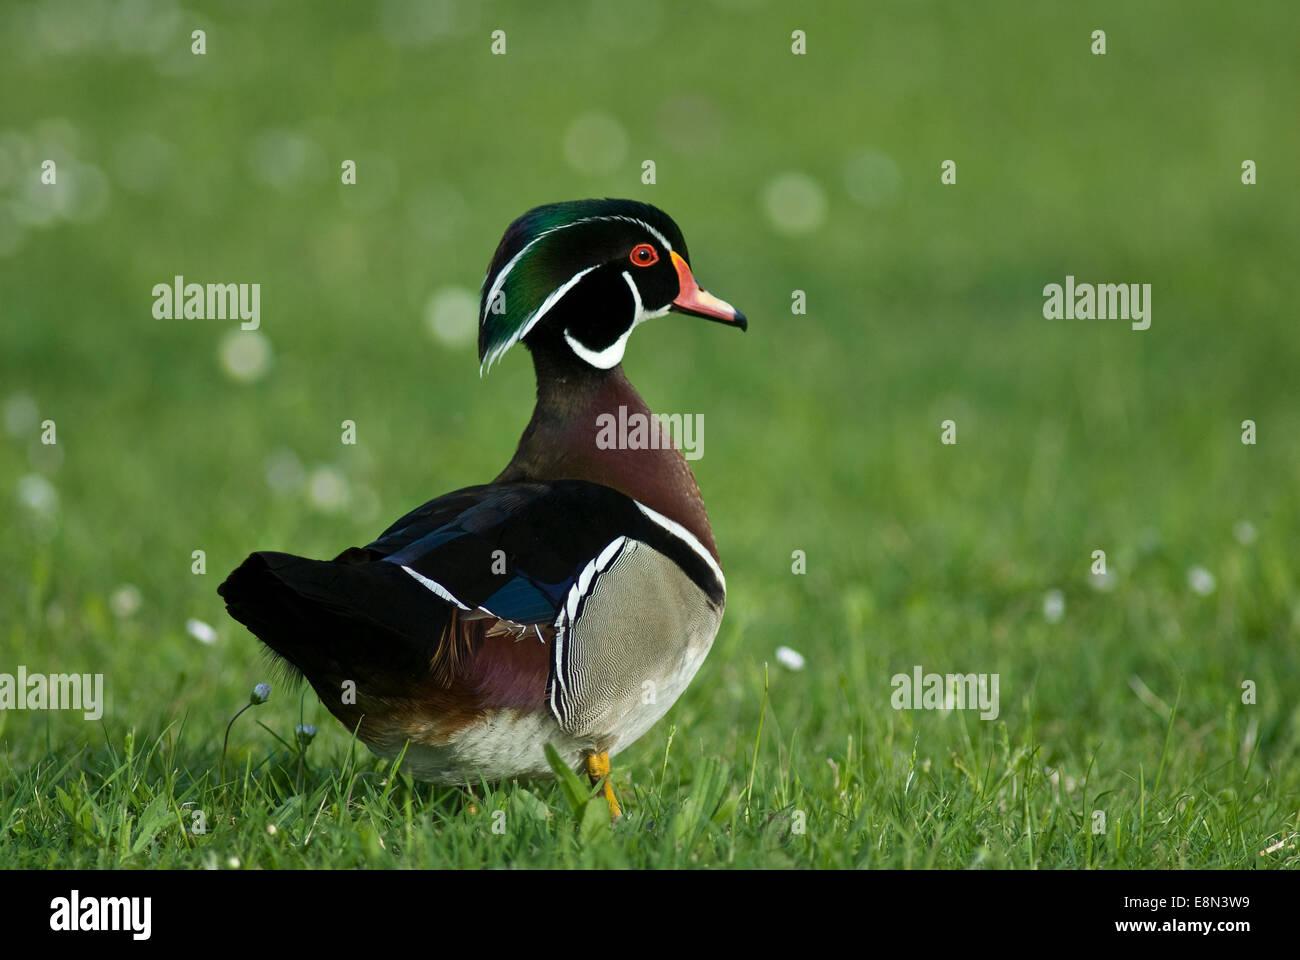 Mandarin duck Aix galericulata, Anatidae, East Asia - Stock Image